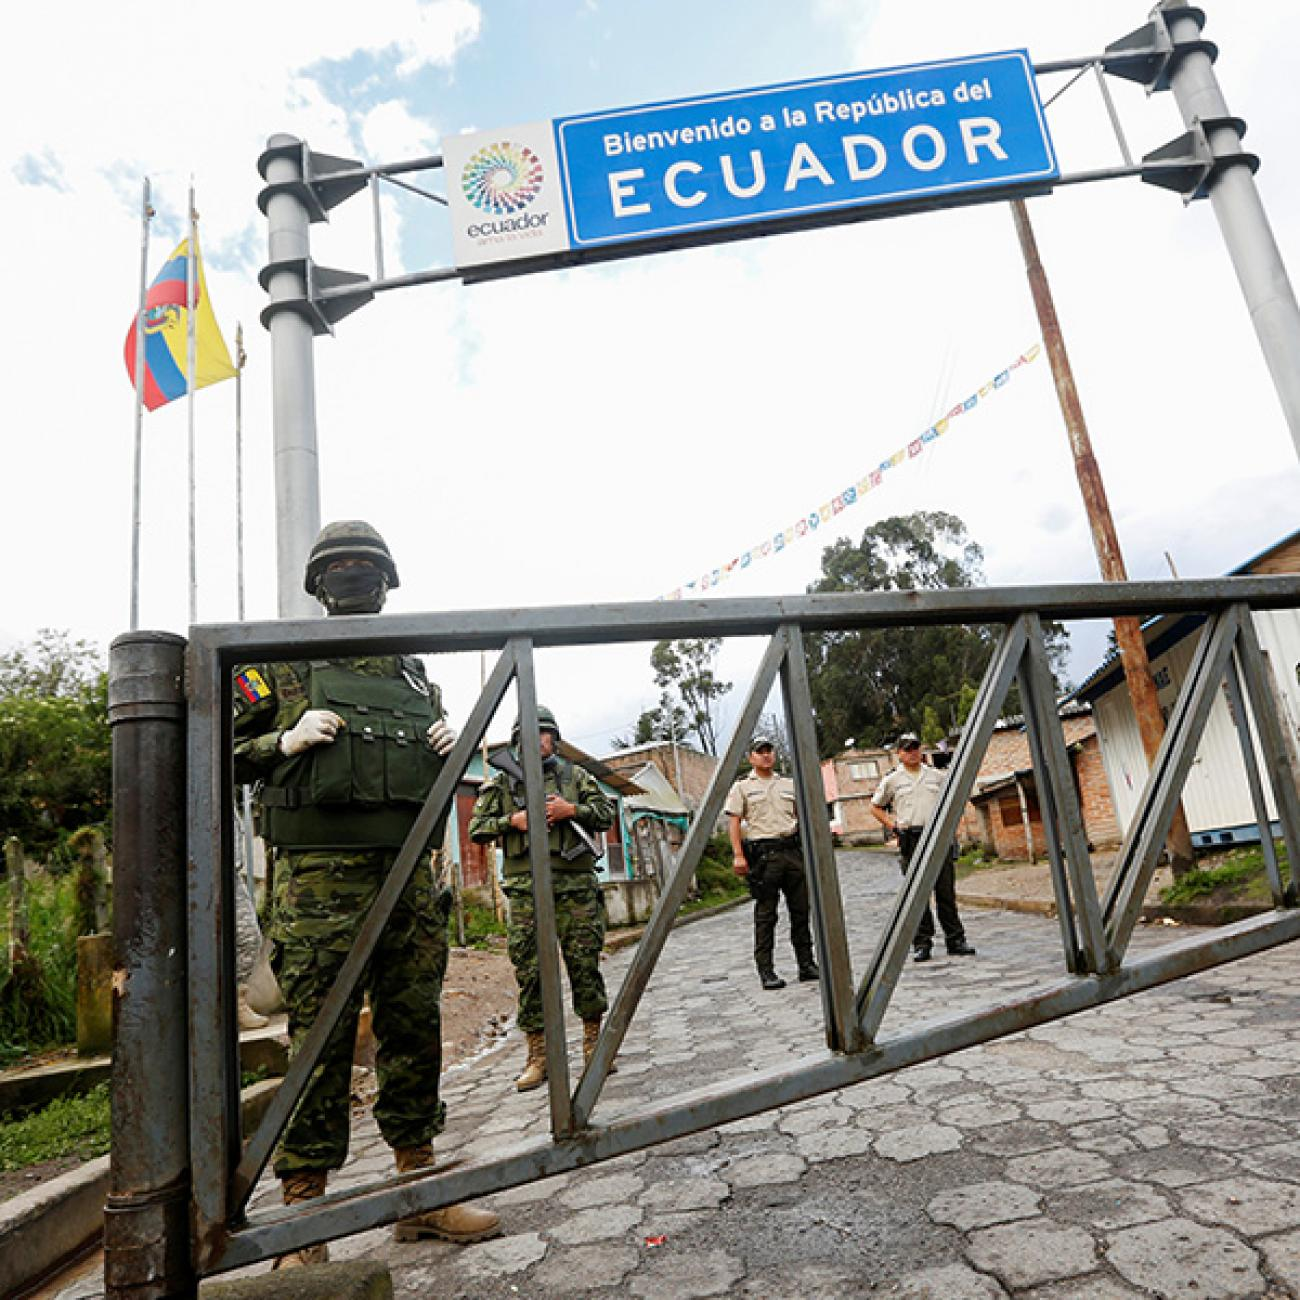 https://www.thinkglobalhealth.org/sites/default/files/styles/max_1300x1300_1_1/public/2020-04/Sacoto.Torres-CoV-Ecuador-4.13.20-RTS367N7-SQUARE.jpg?itok=je3fJEyq